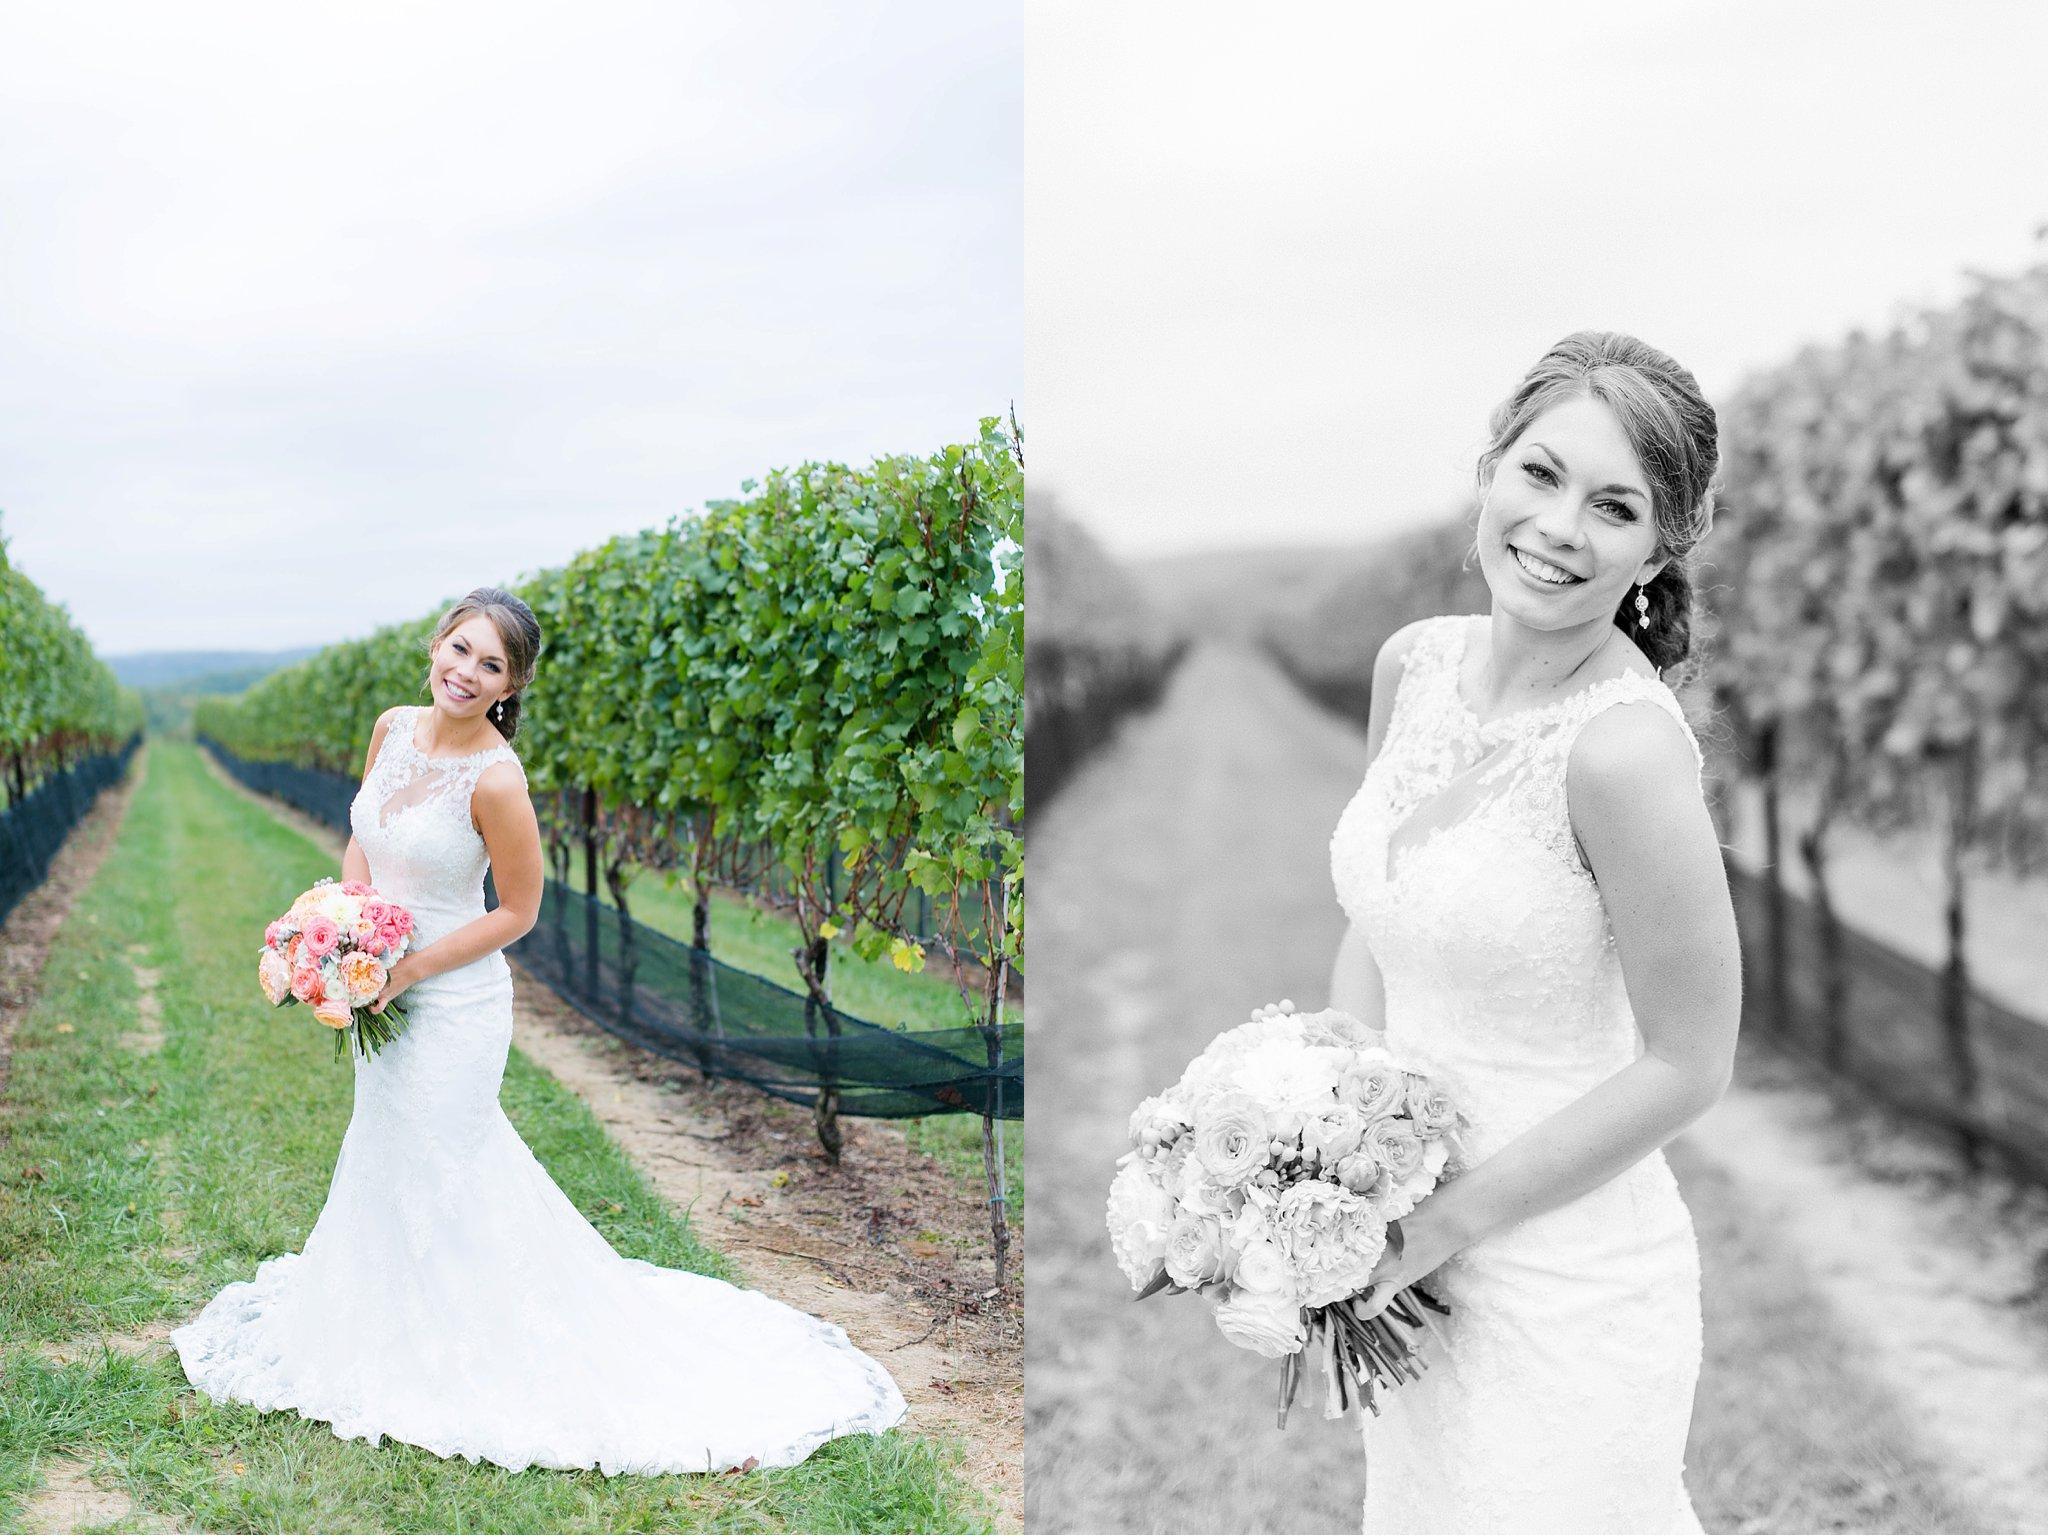 Stone Tower Winery Wedding Photos Virginia Wedding Photographer Megan Kelsey Photography Sam & Angela-195.jpg